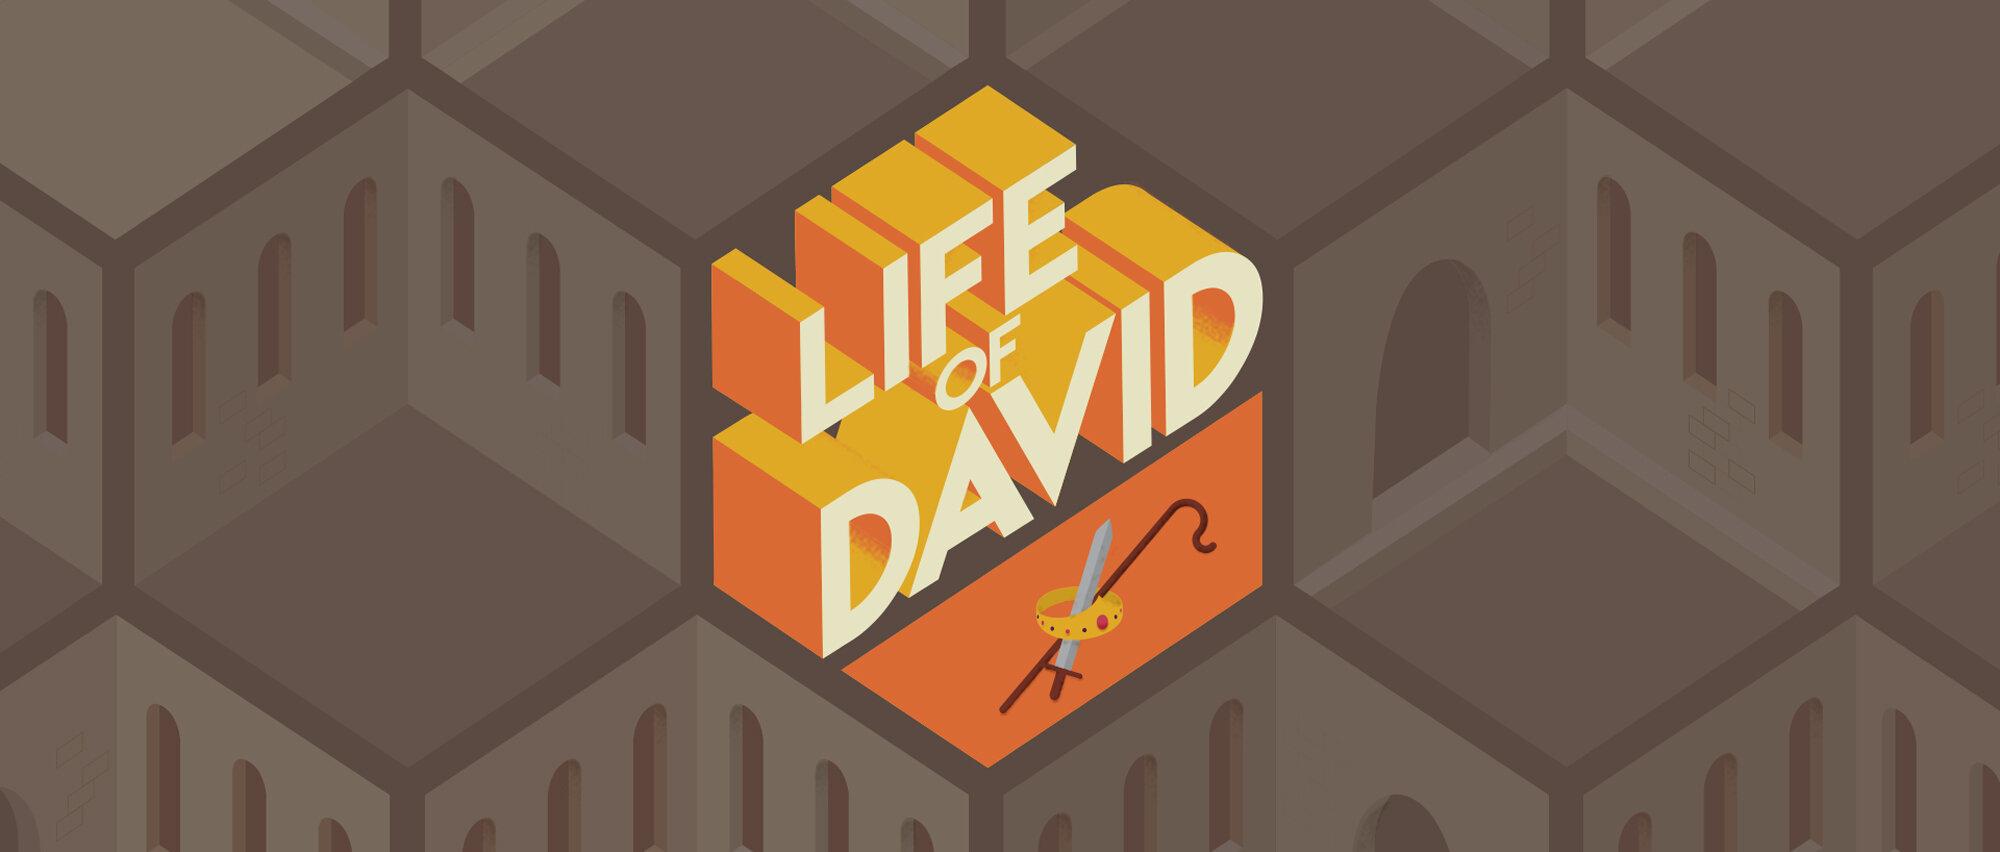 David-Logo-Web.jpg